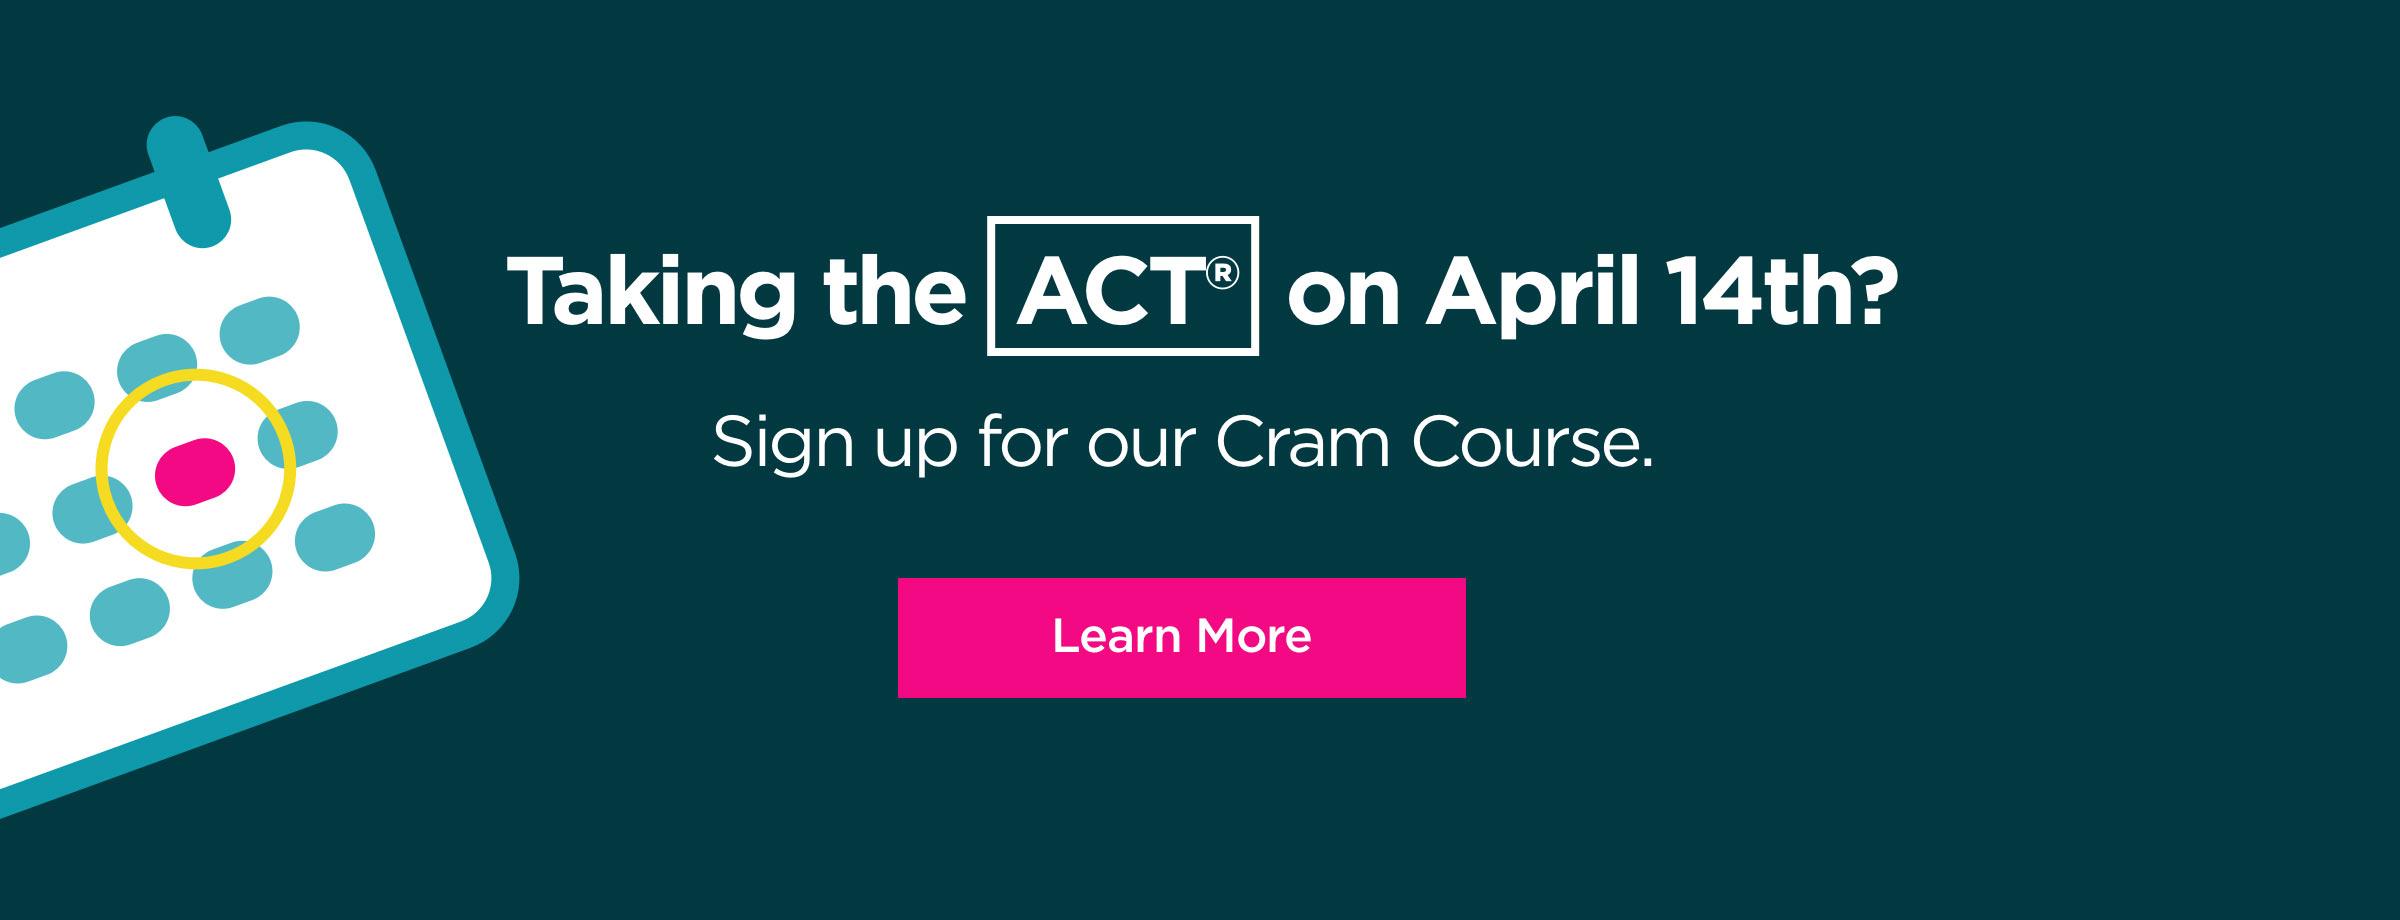 ACT Cram Course